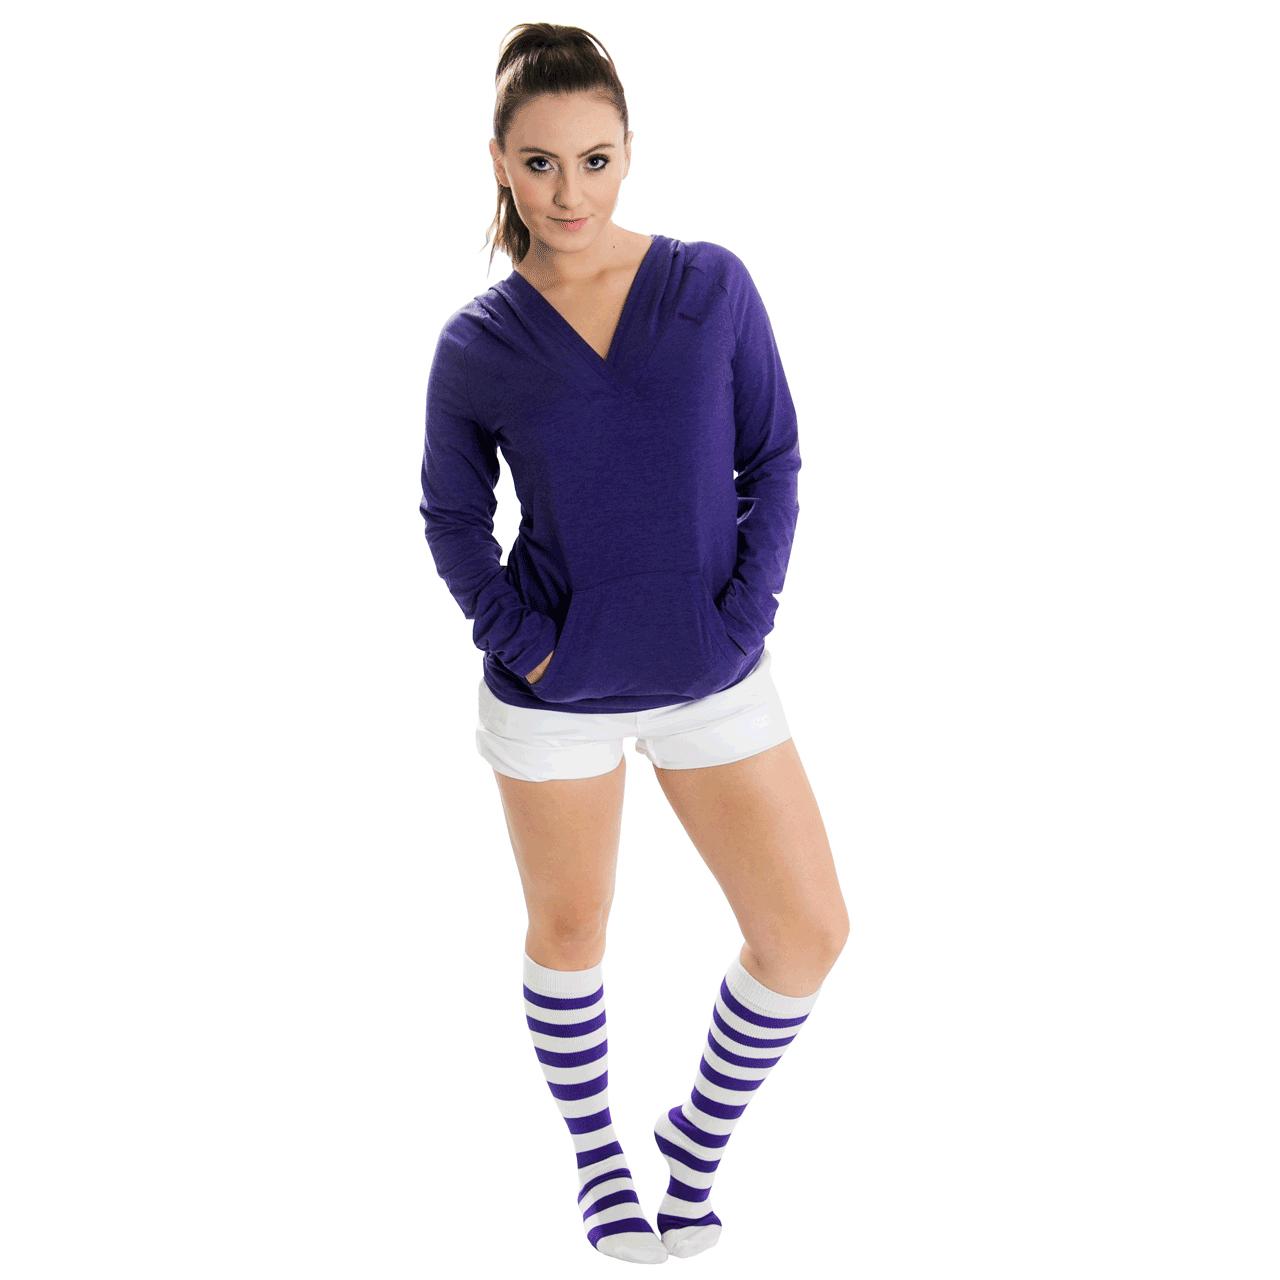 Chrissy's knee high striped socks